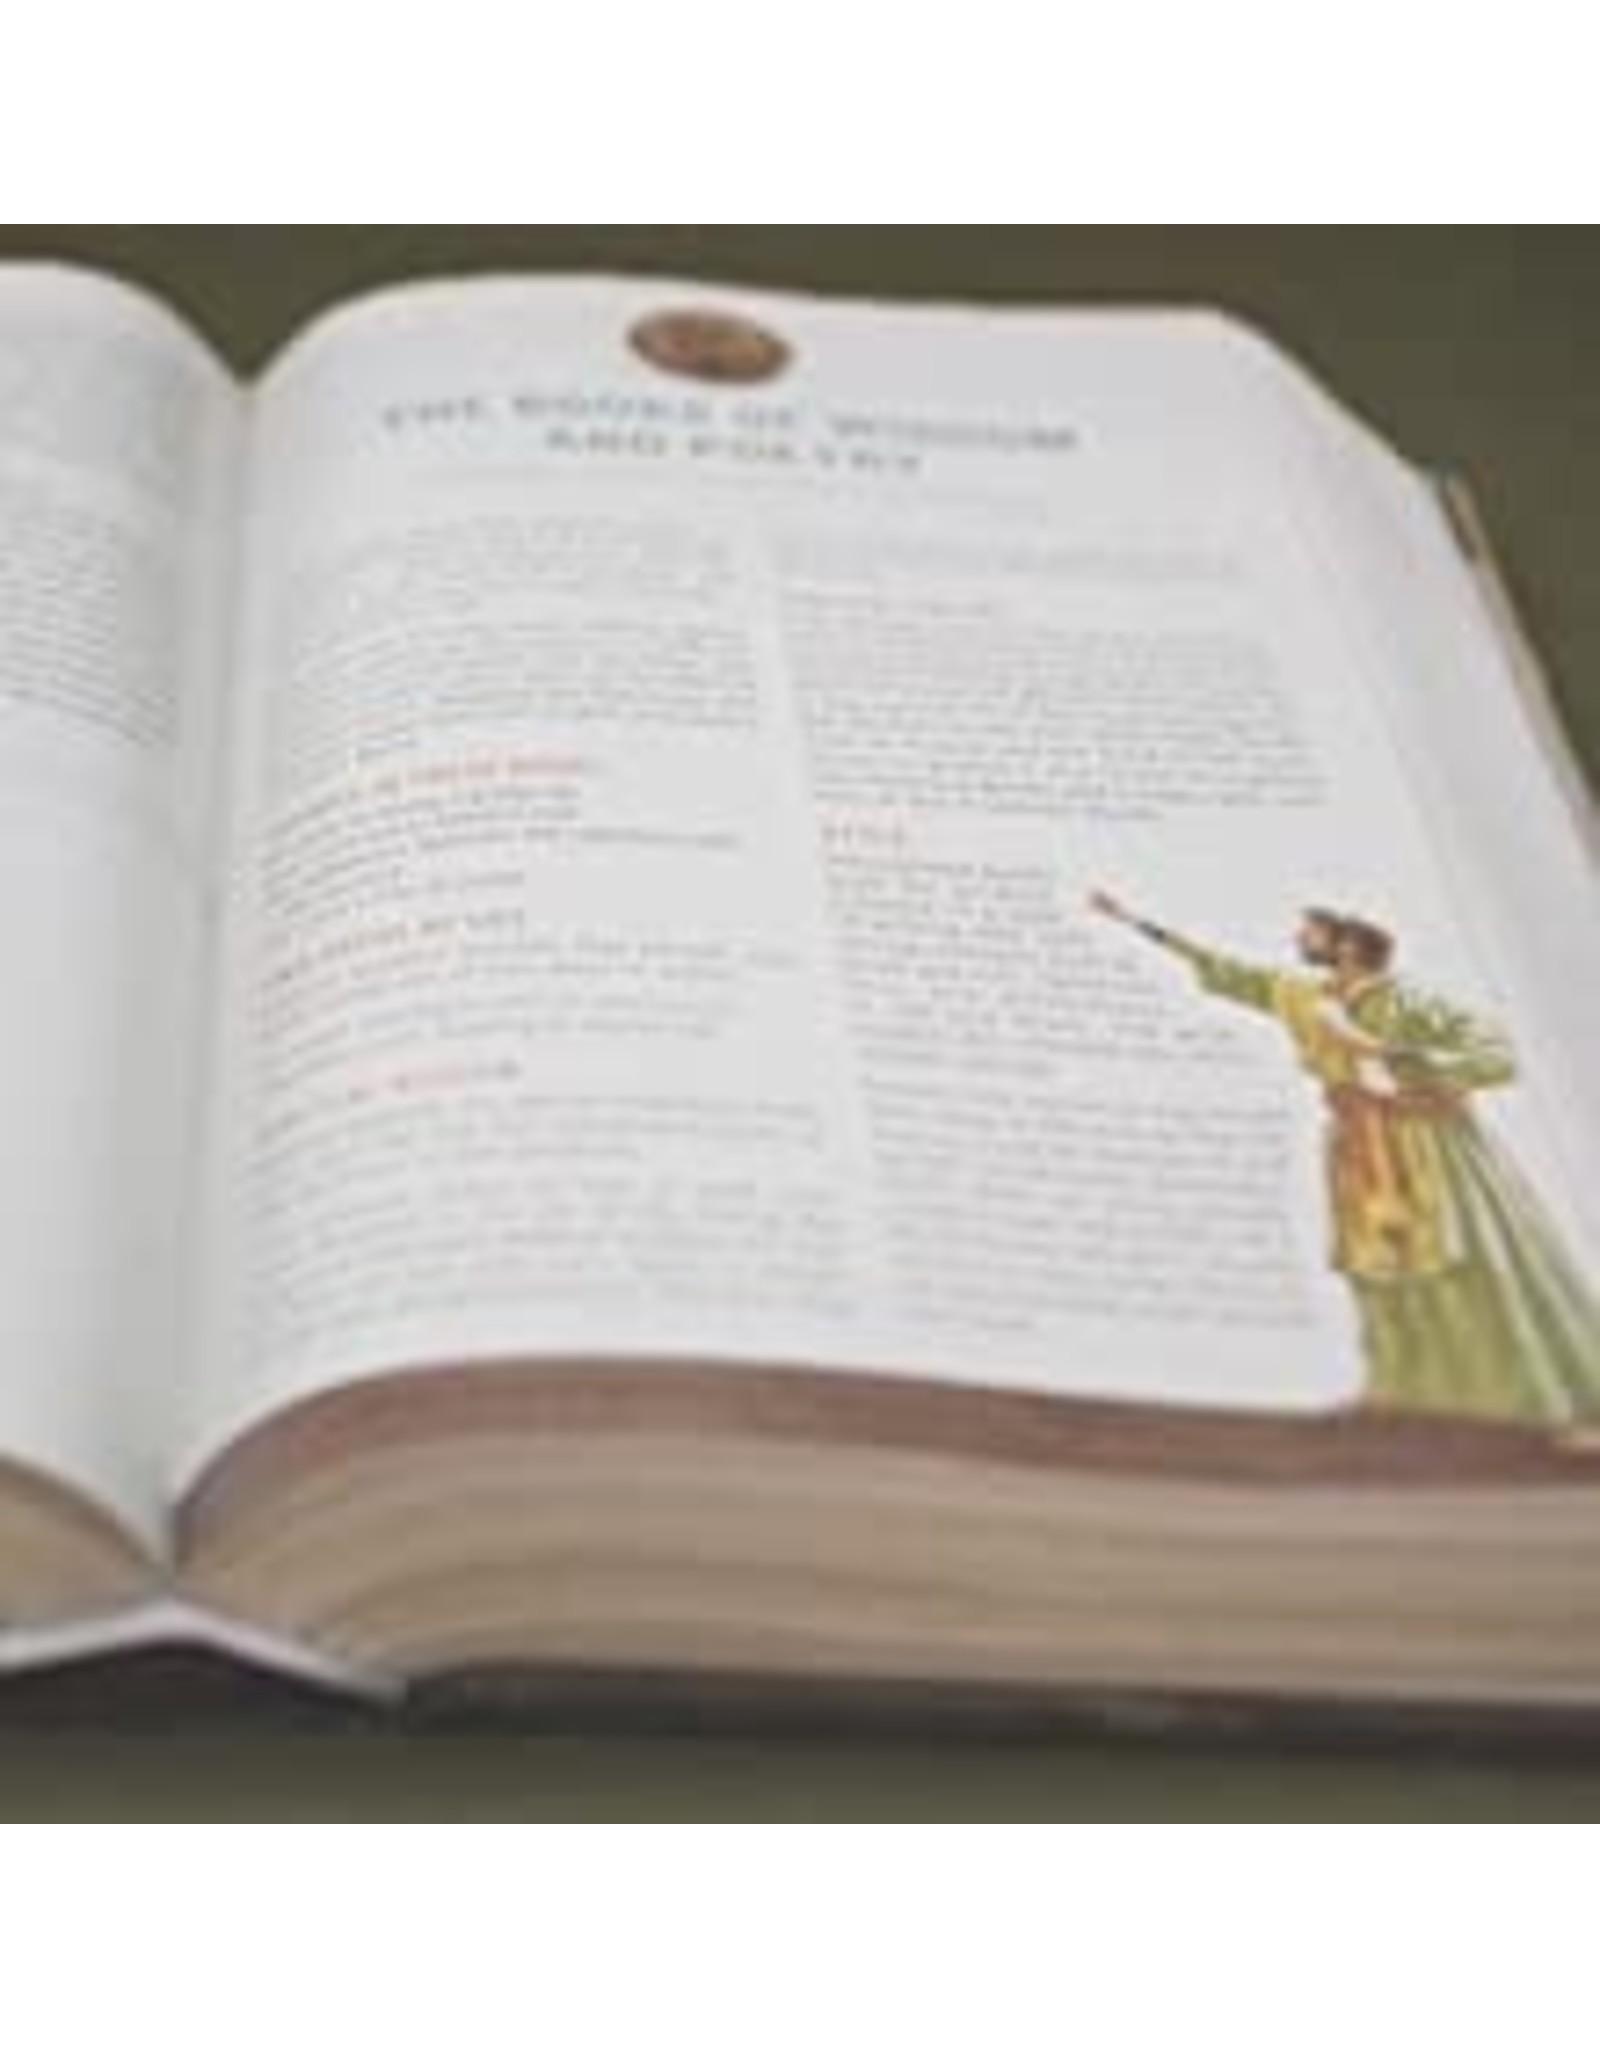 Crossway / Good News ESV Following Jesus Bible